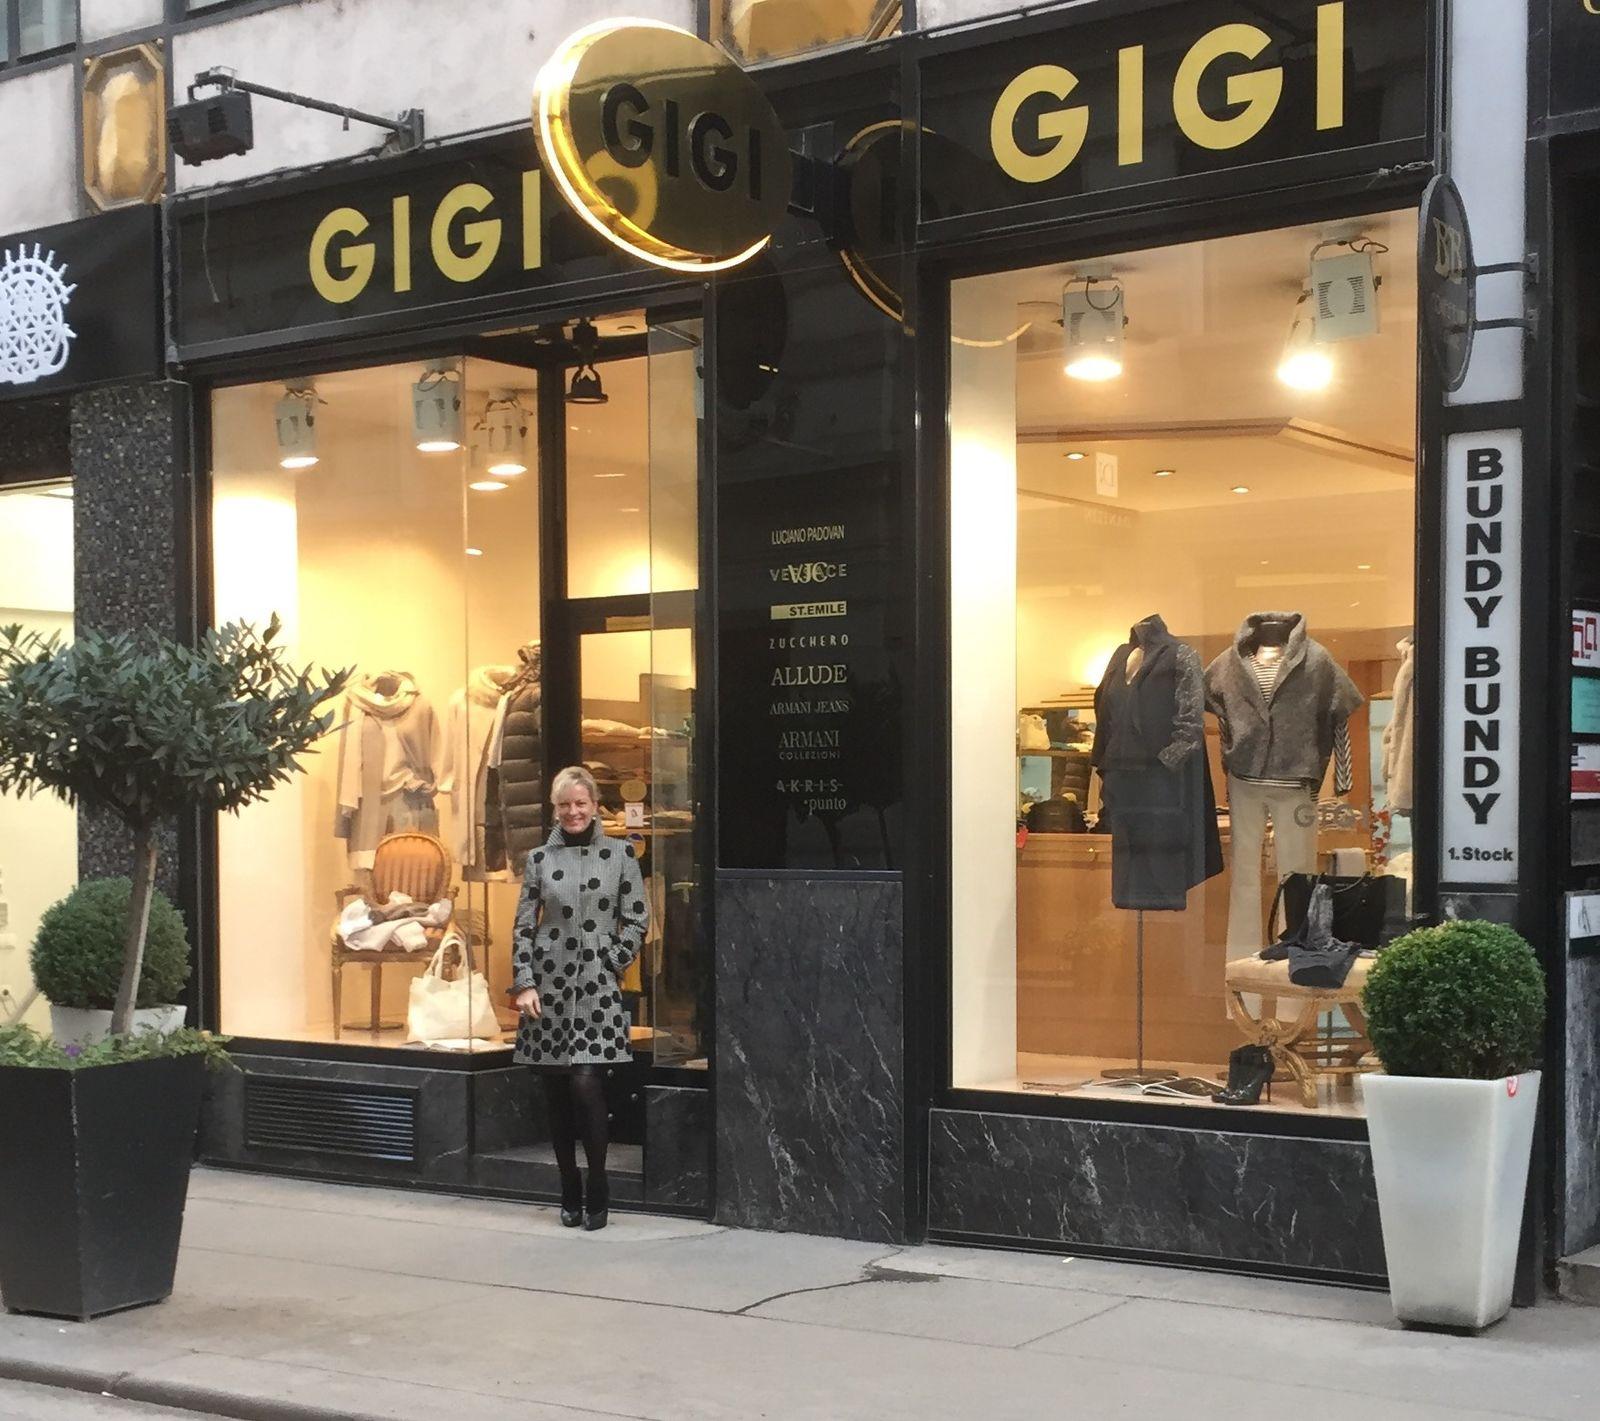 Boutique GIGI in Wien